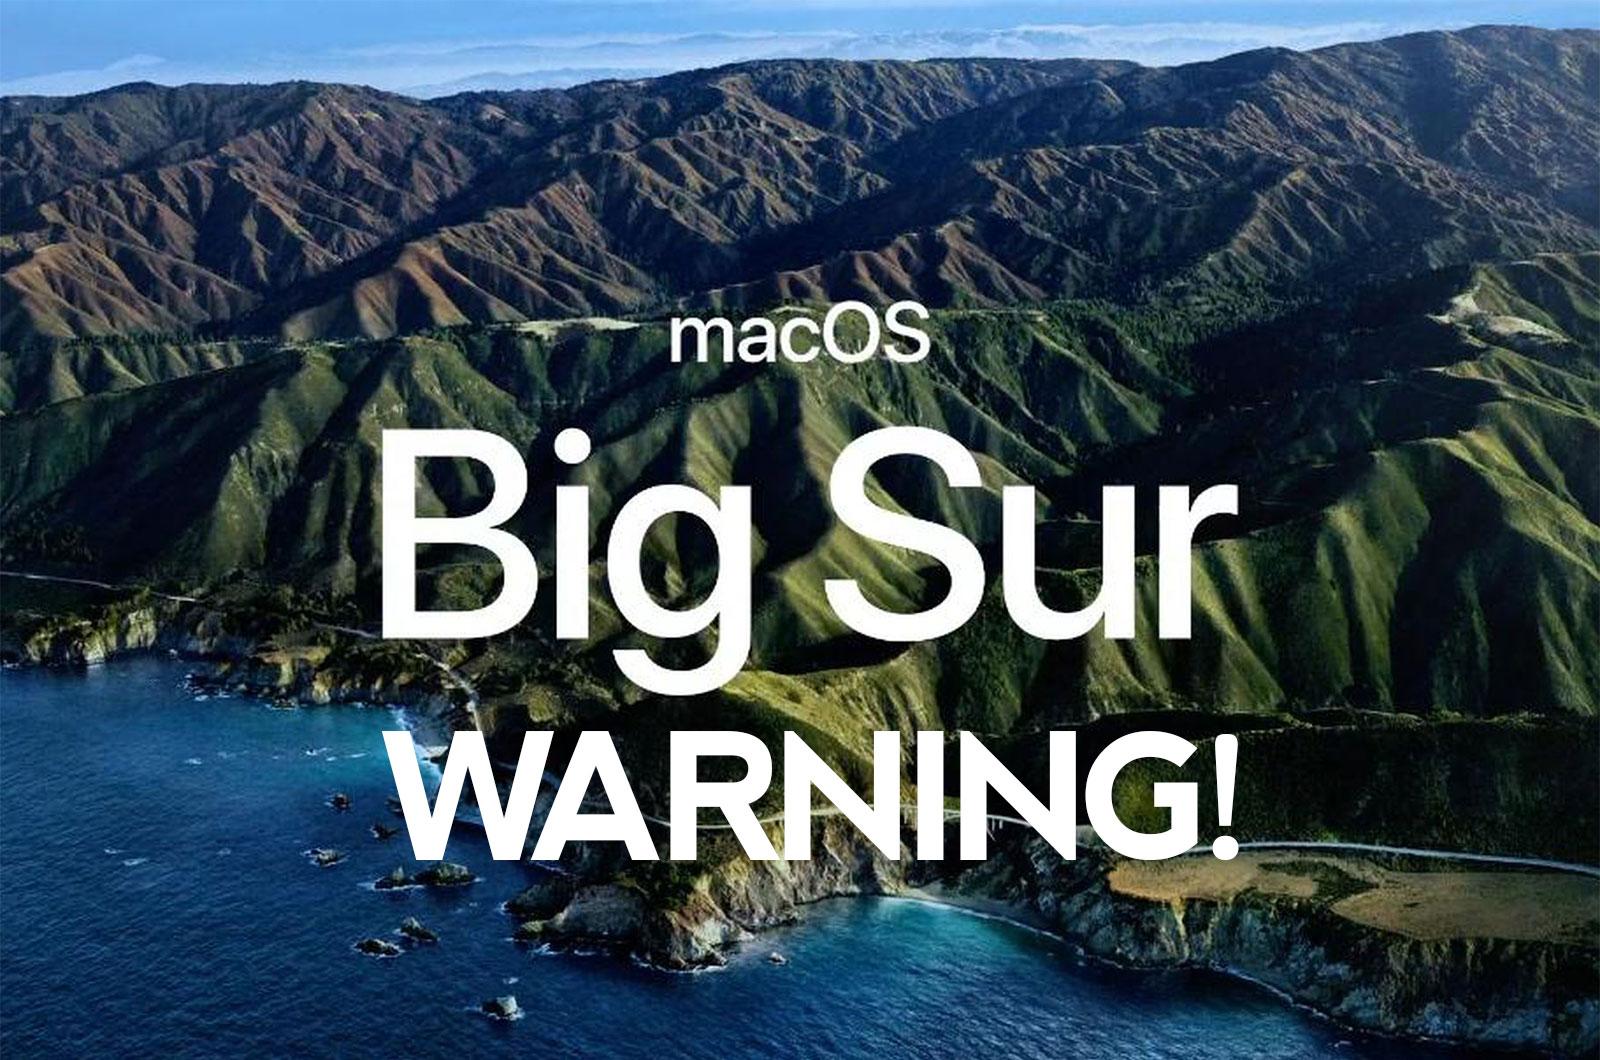 MacOS 11 Big Sur Warning